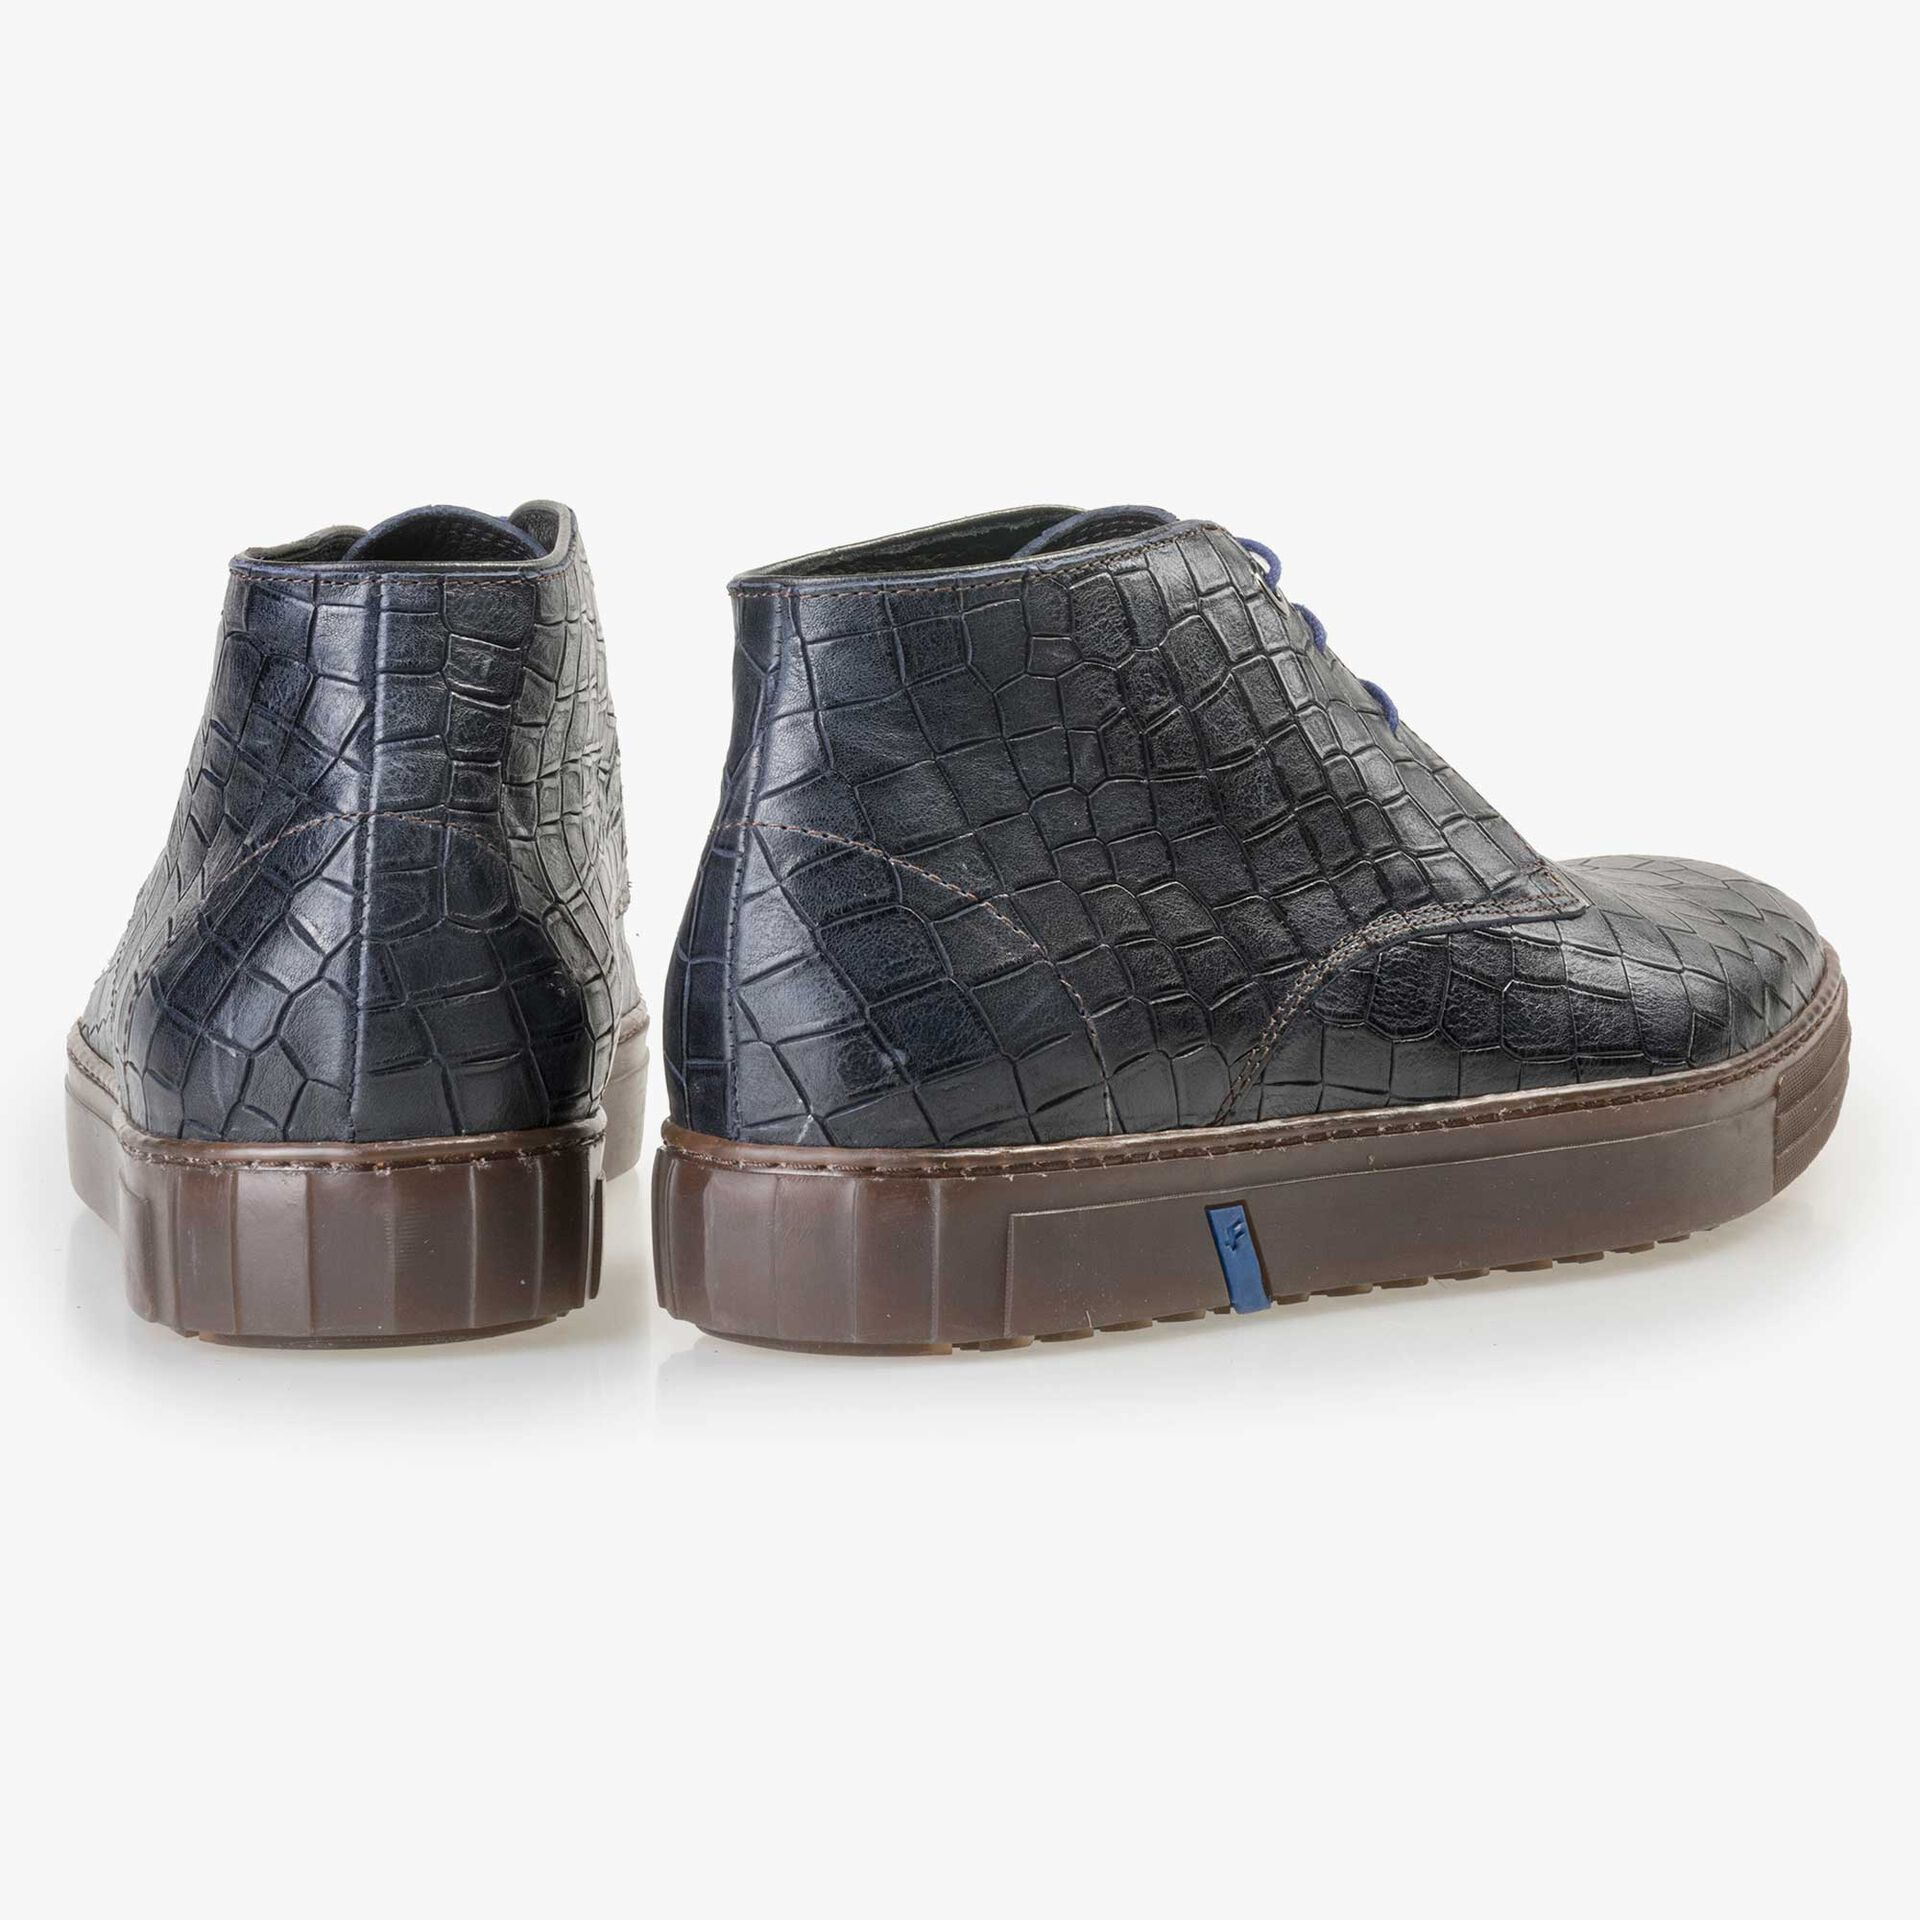 Floris van Bommel men's mid-high blue city sneaker finished with a crocodile print